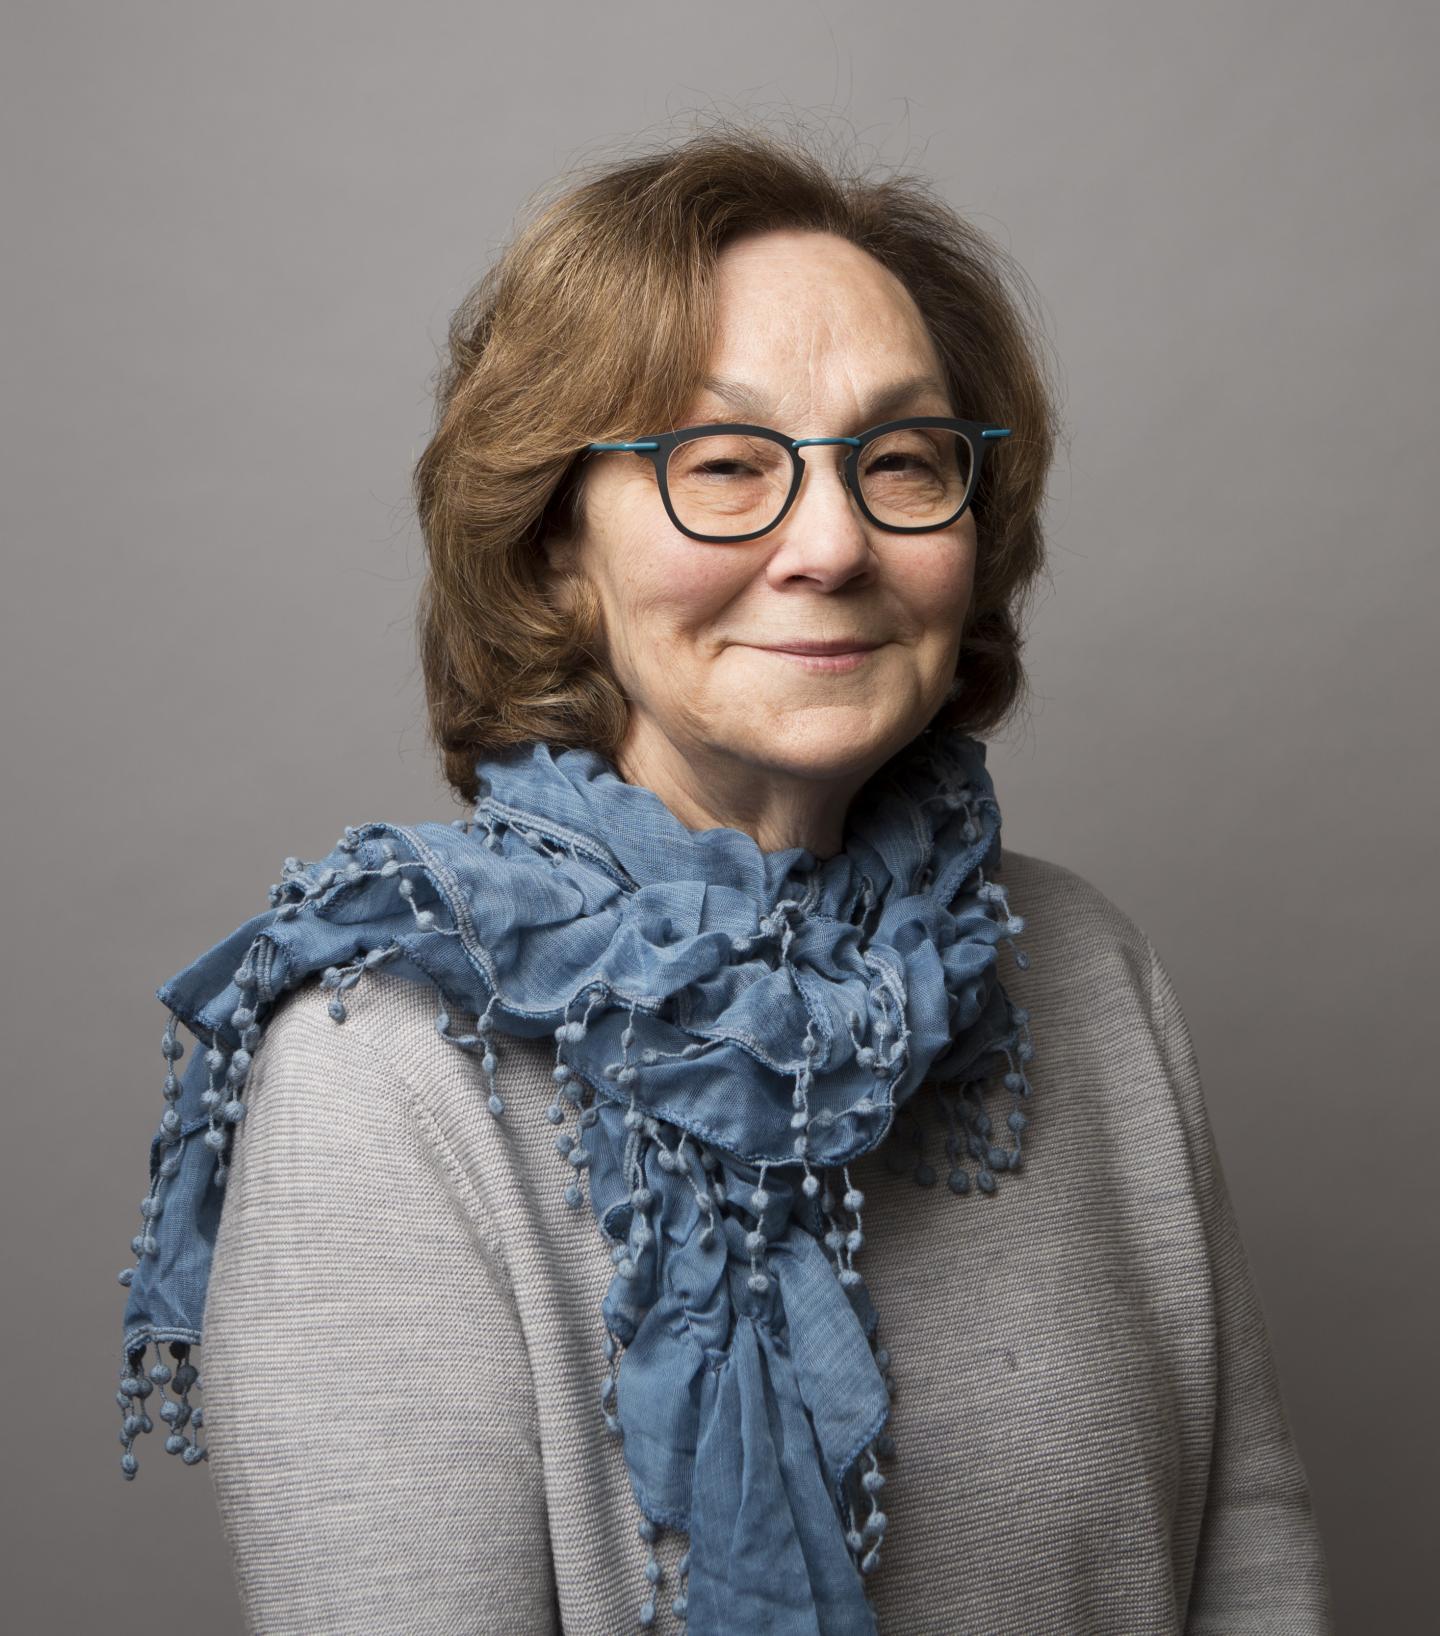 Dr. Lynn Hasher, Baycrest Centre for Geriatric Care